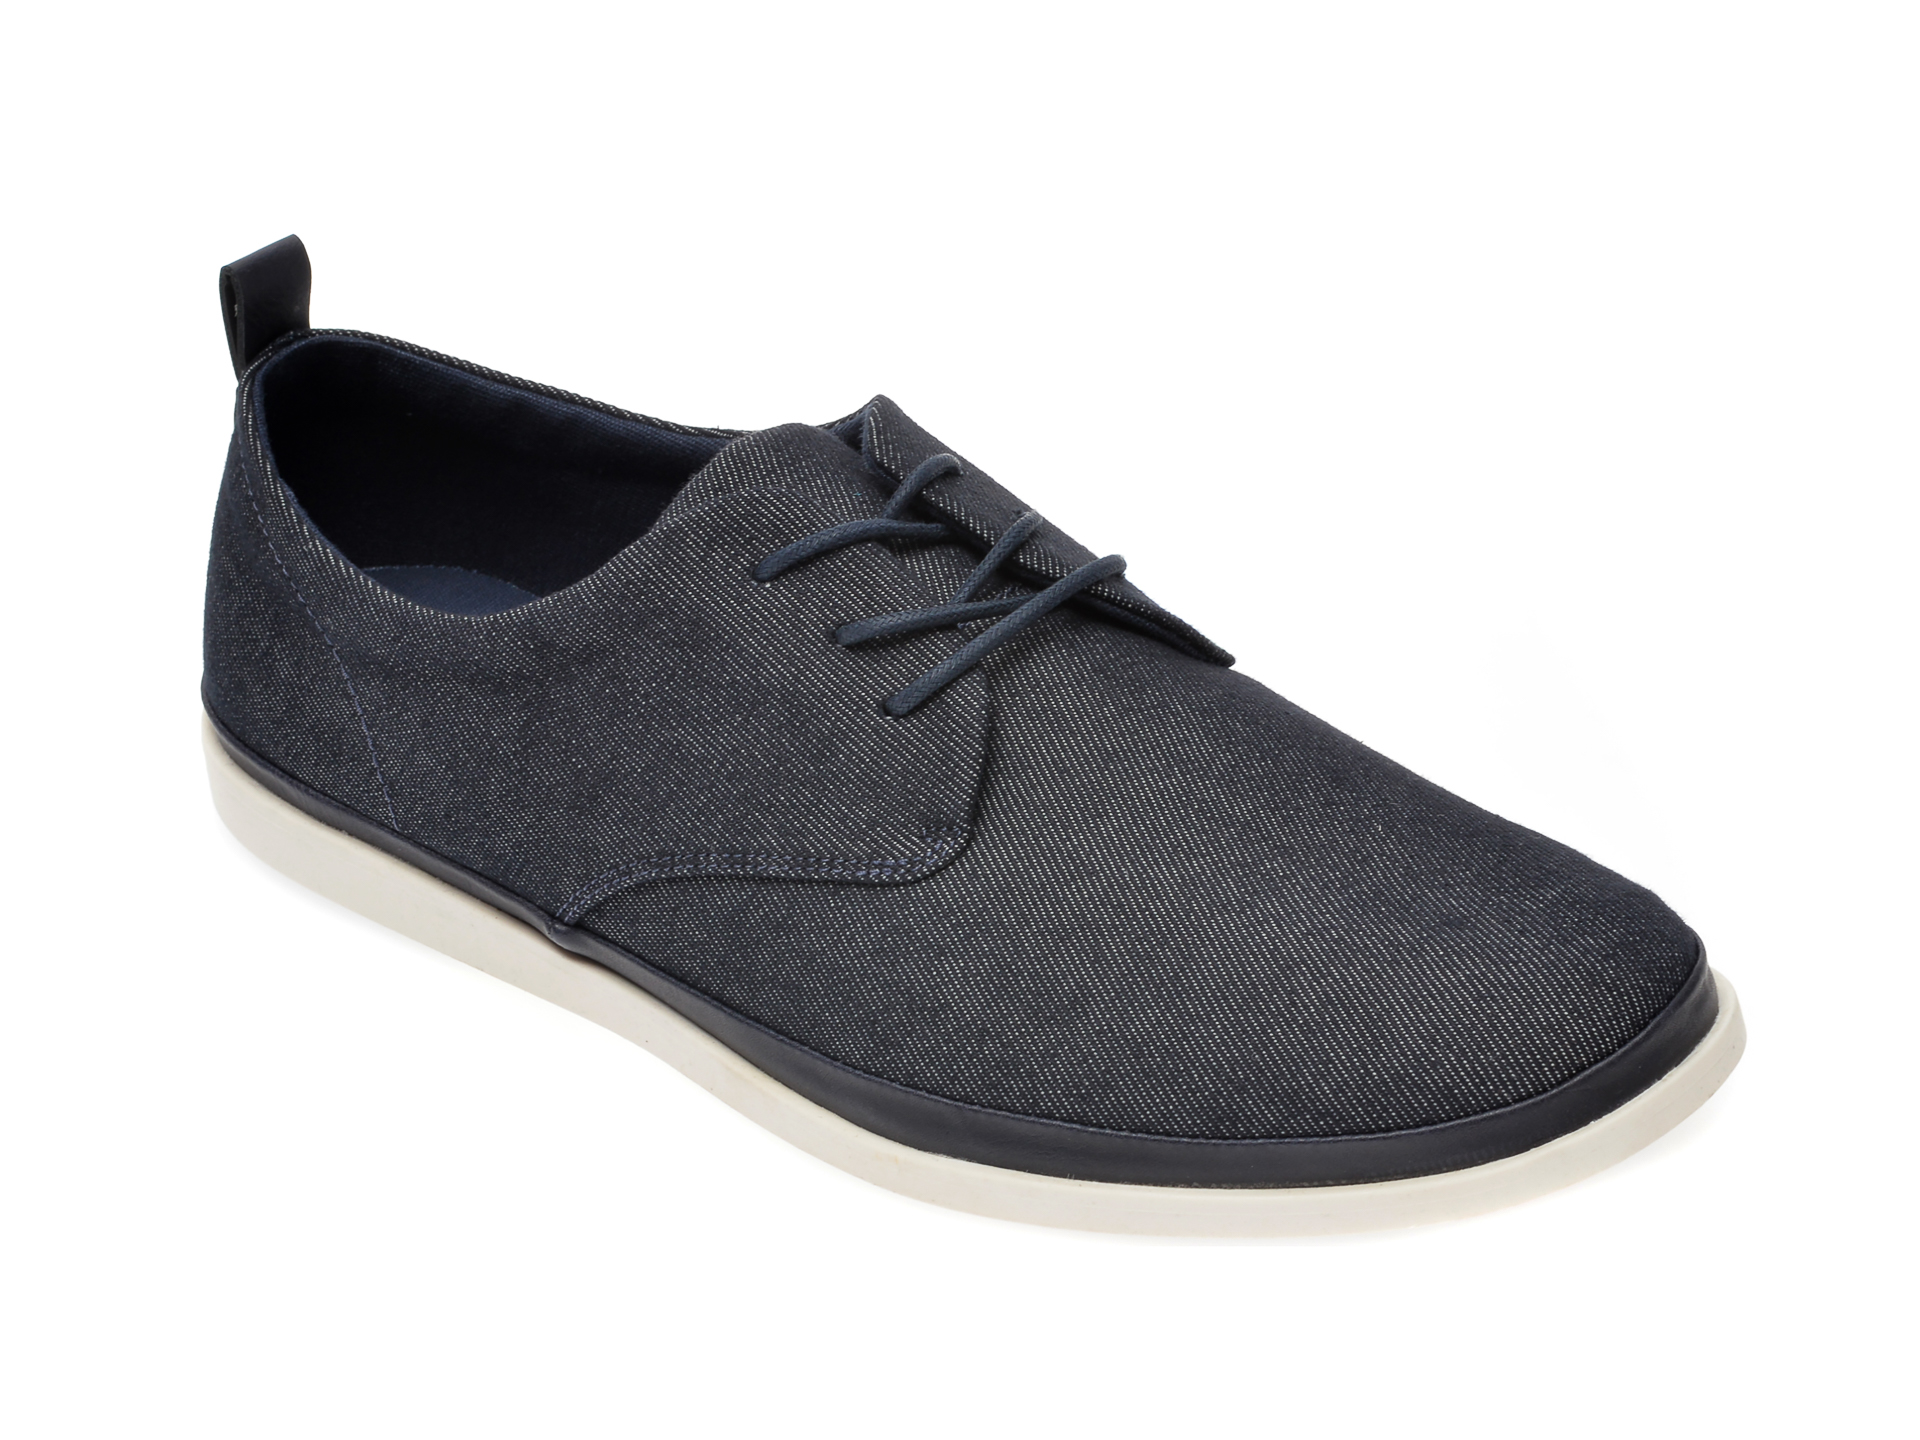 Pantofi Aldo Bleumarin, Zavoloko410, Din Piele Ecologica